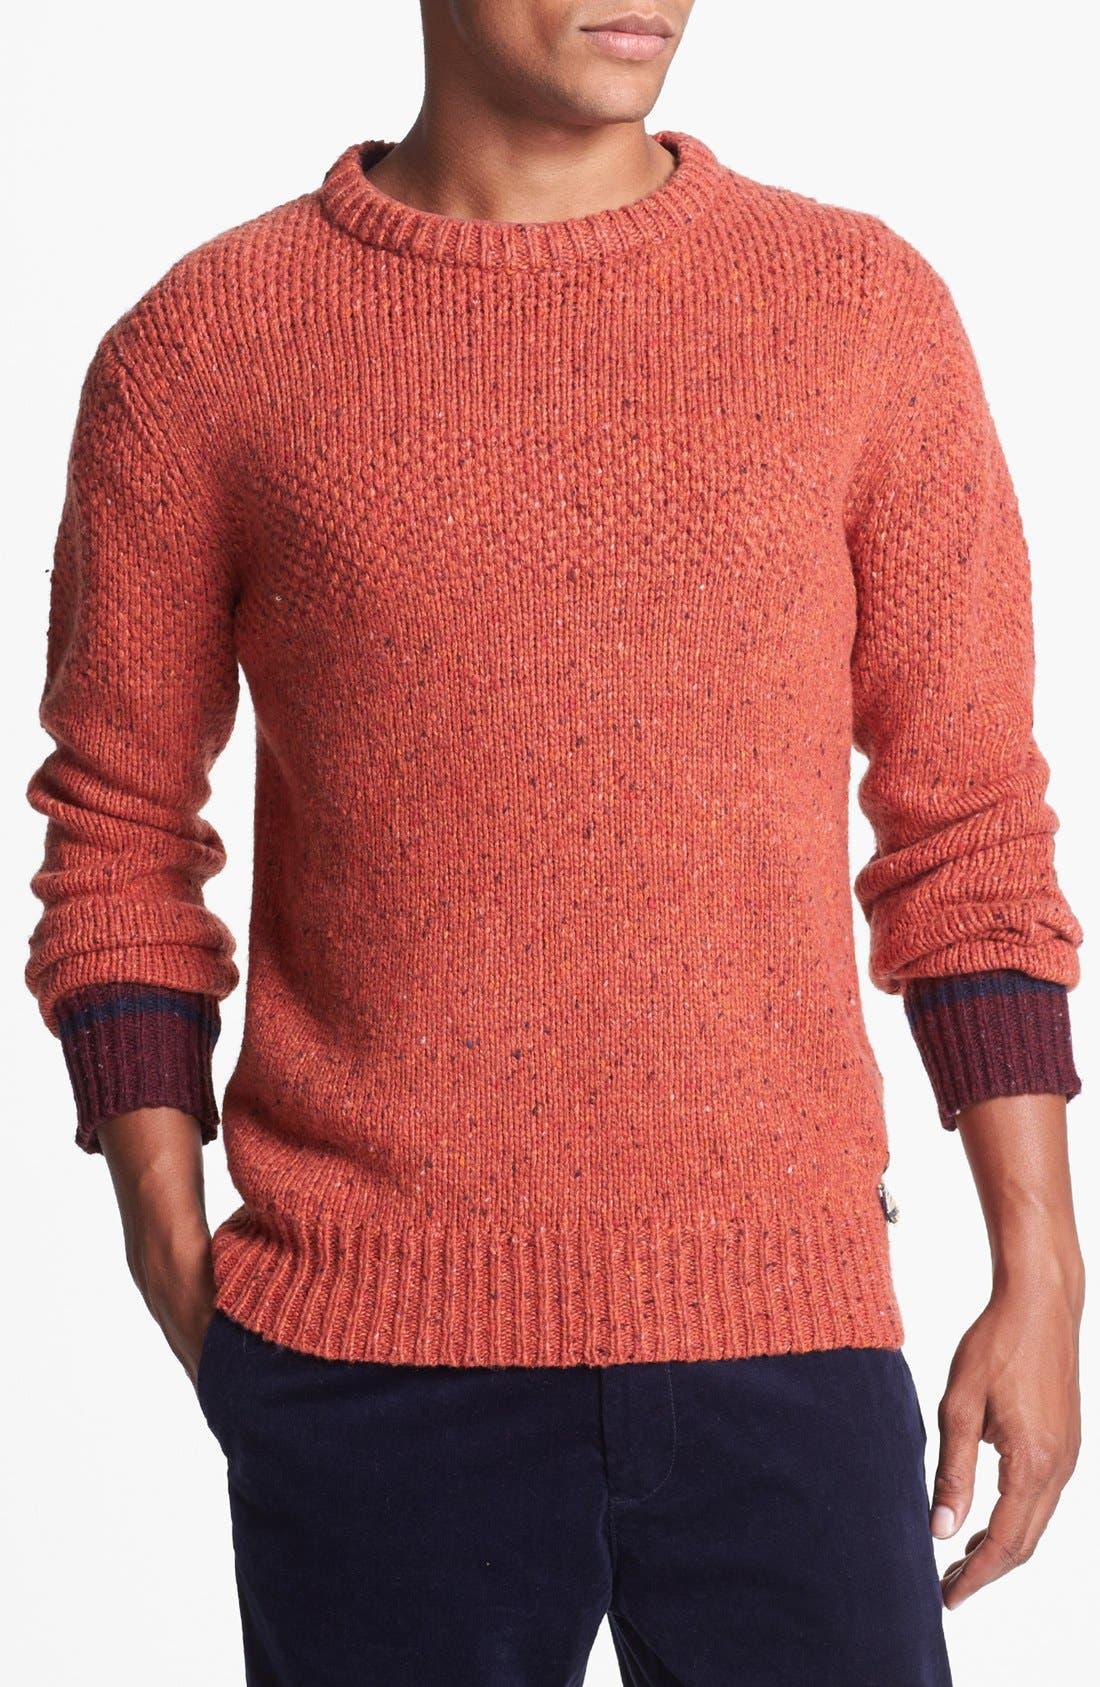 Main Image - Scotch & Soda Crewneck Sweater